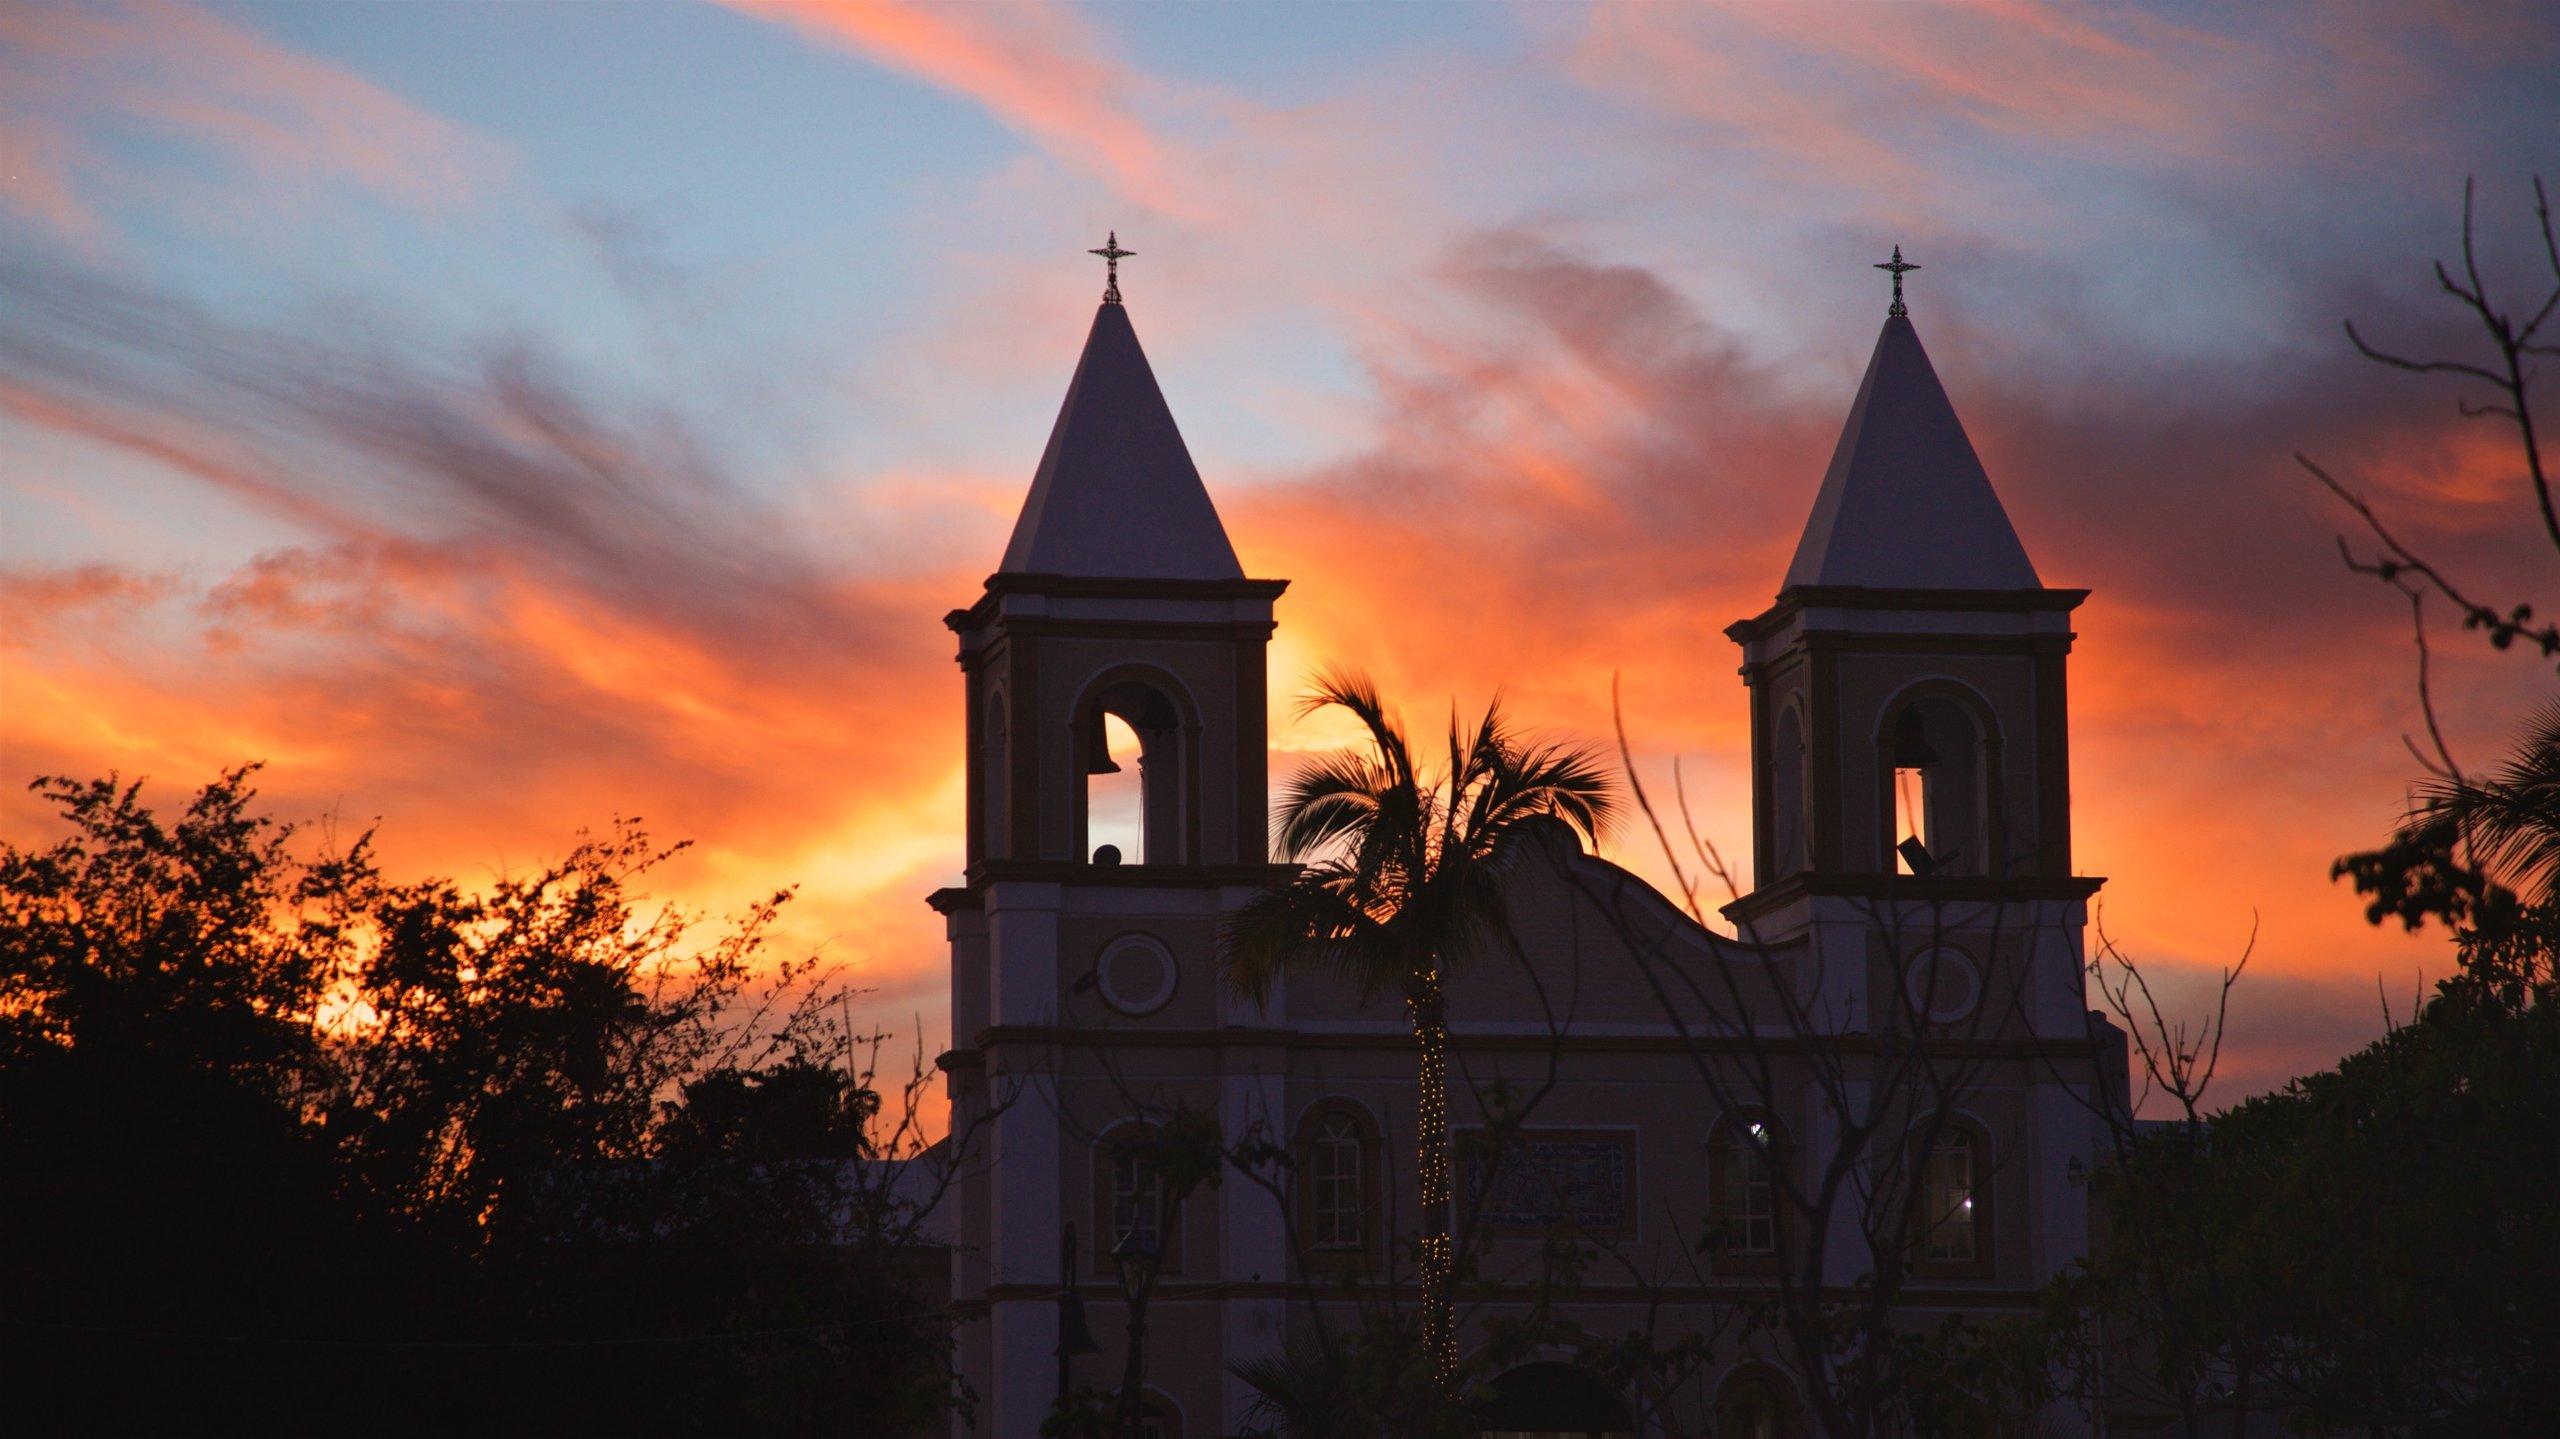 Stadtzentrum von Cabo San Lucas, Los Cabos, Baja California Sur/Süden der Baja California, Mexiko